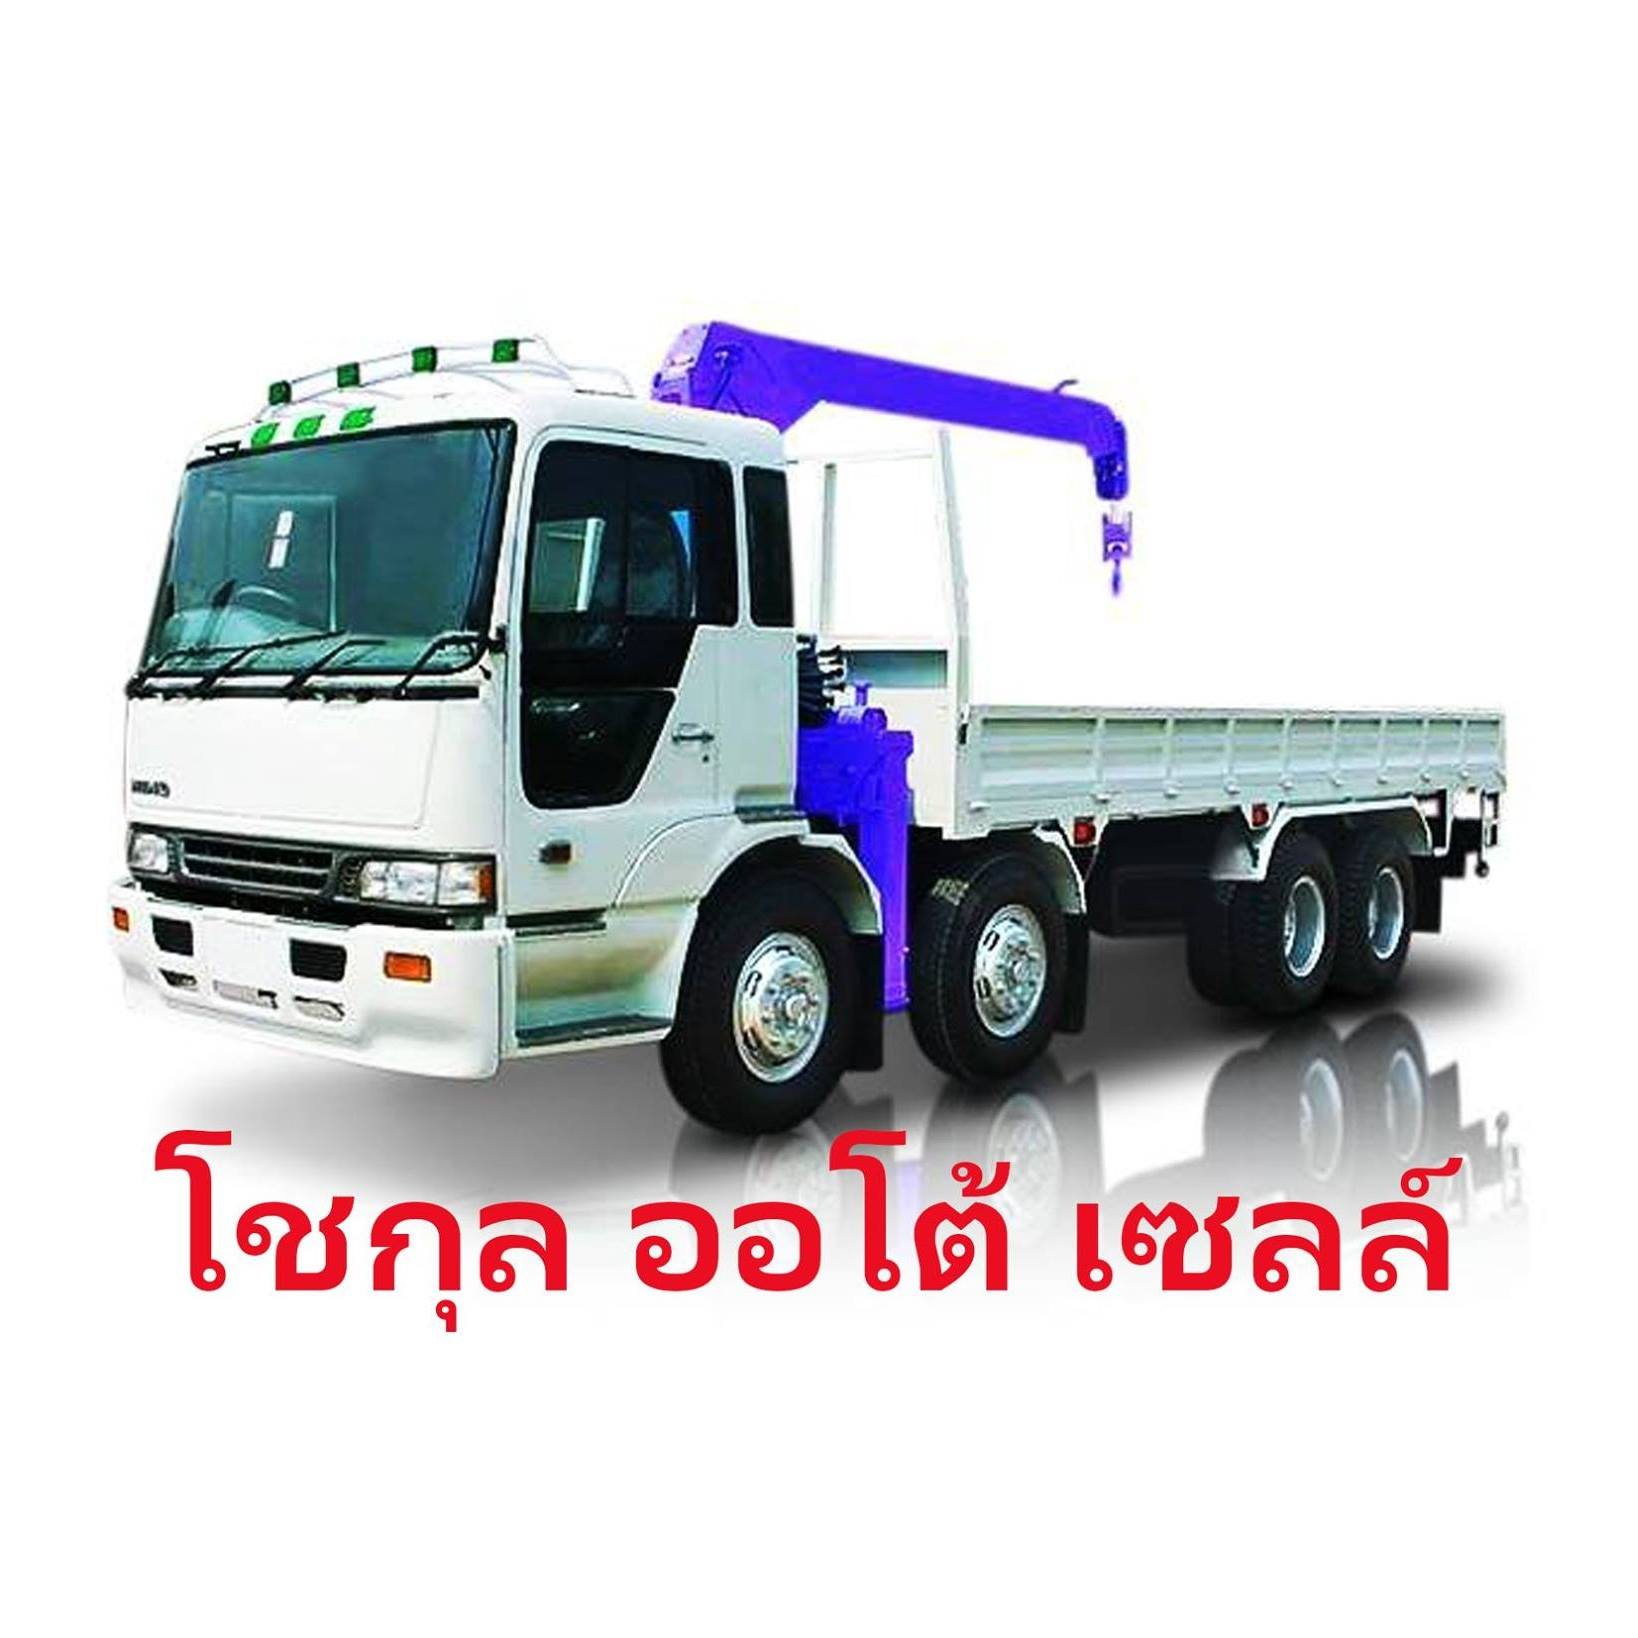 truck2hand profile ศุภากร (ราชบุรี)